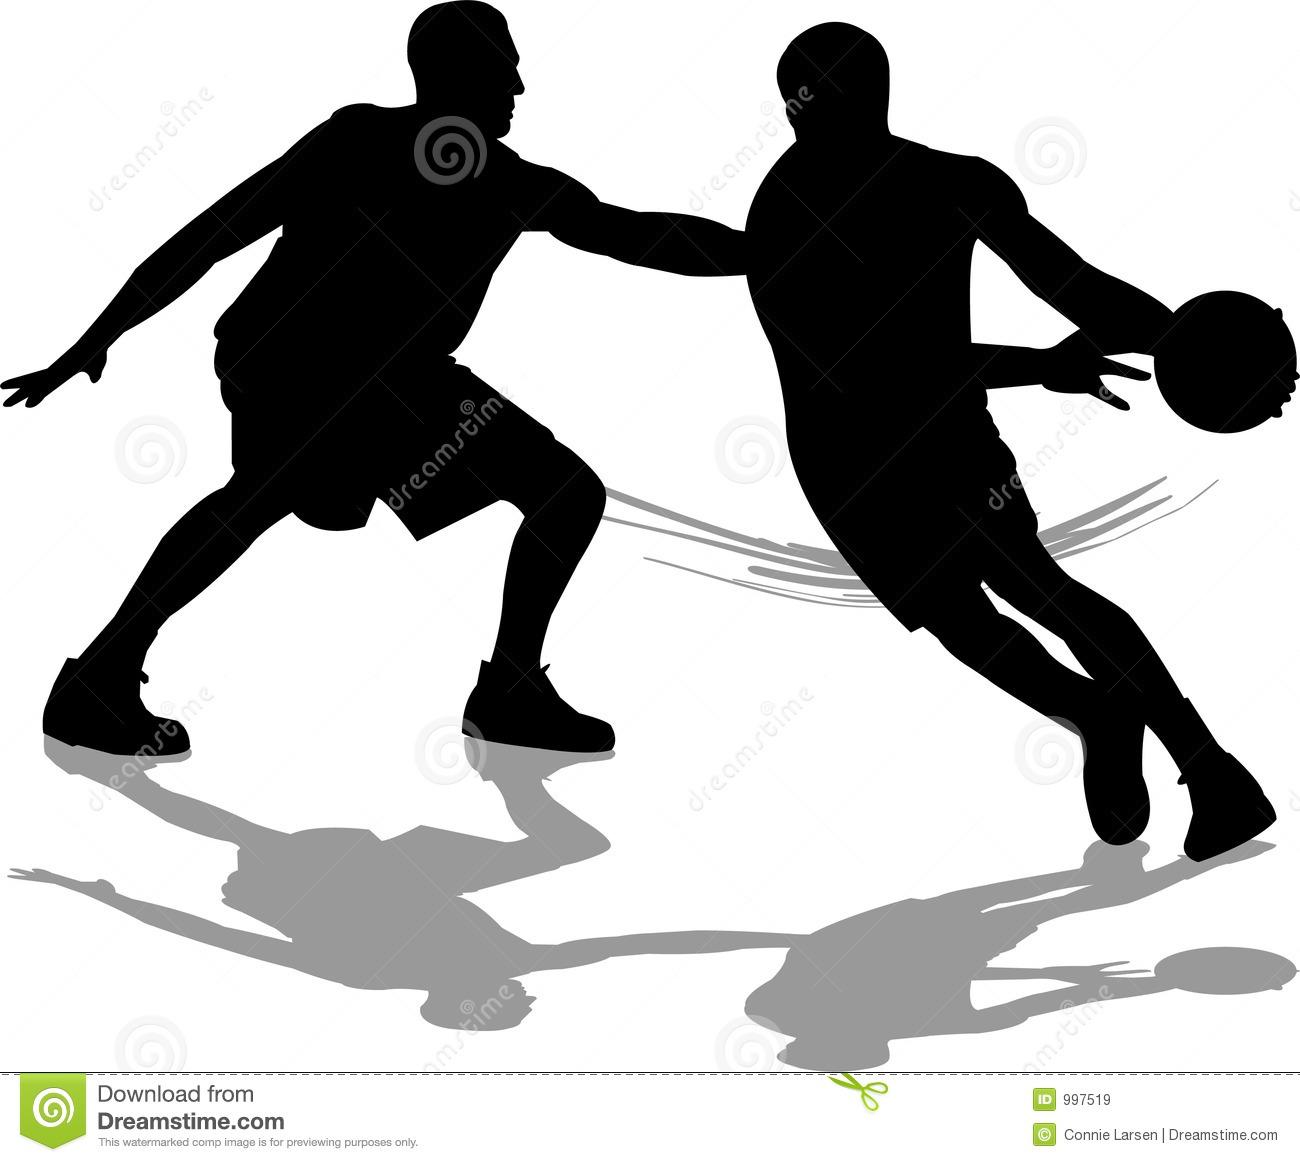 Basketball defense clipart.